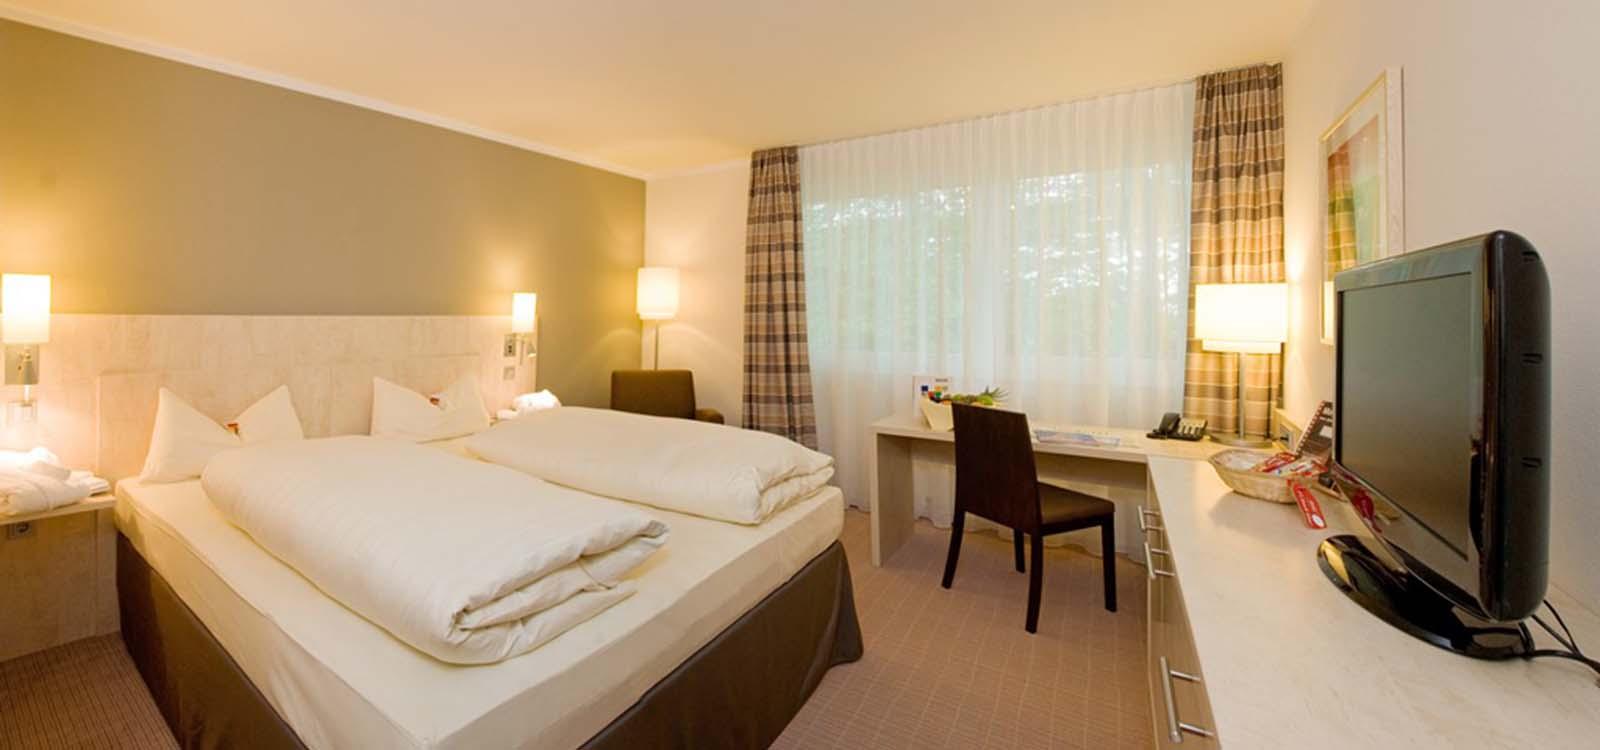 Park Inn Hotel Bielefeld